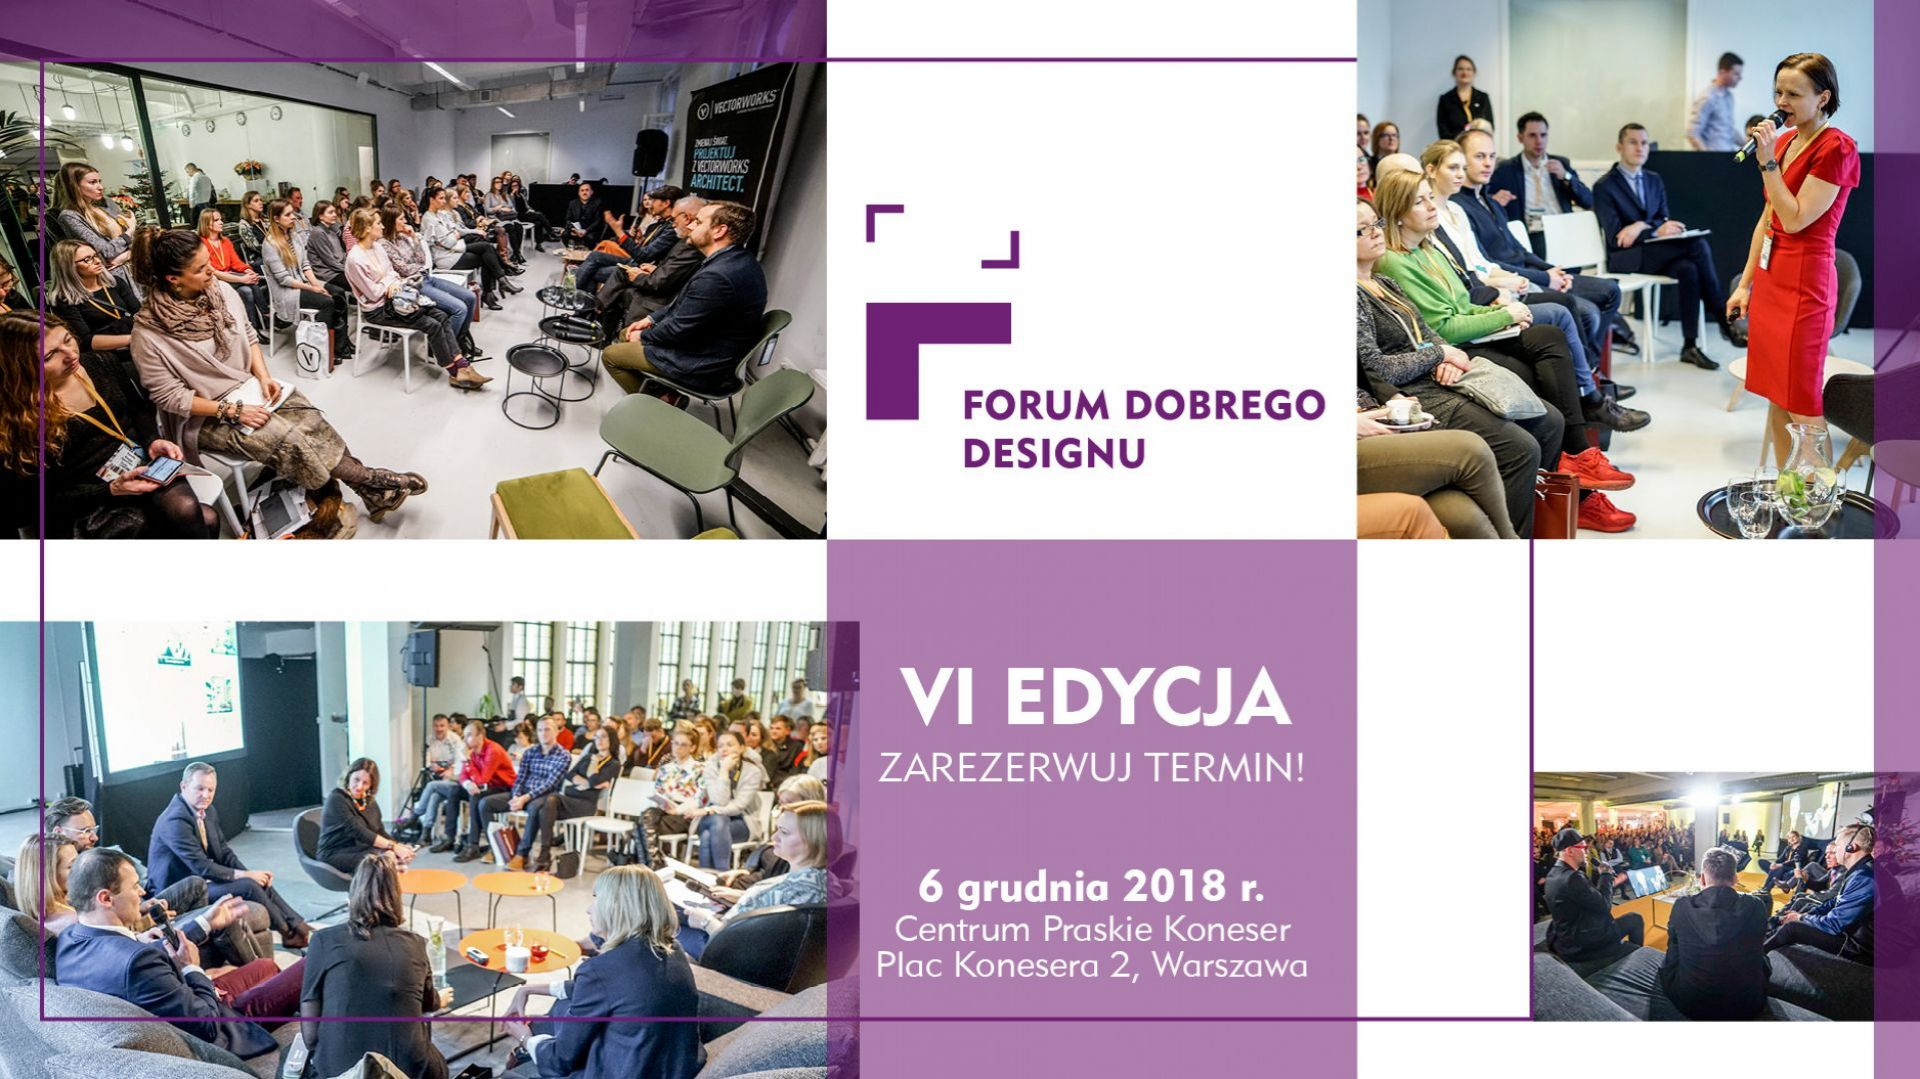 forum-dobrego-designu-2018-co-w-programie.jpg